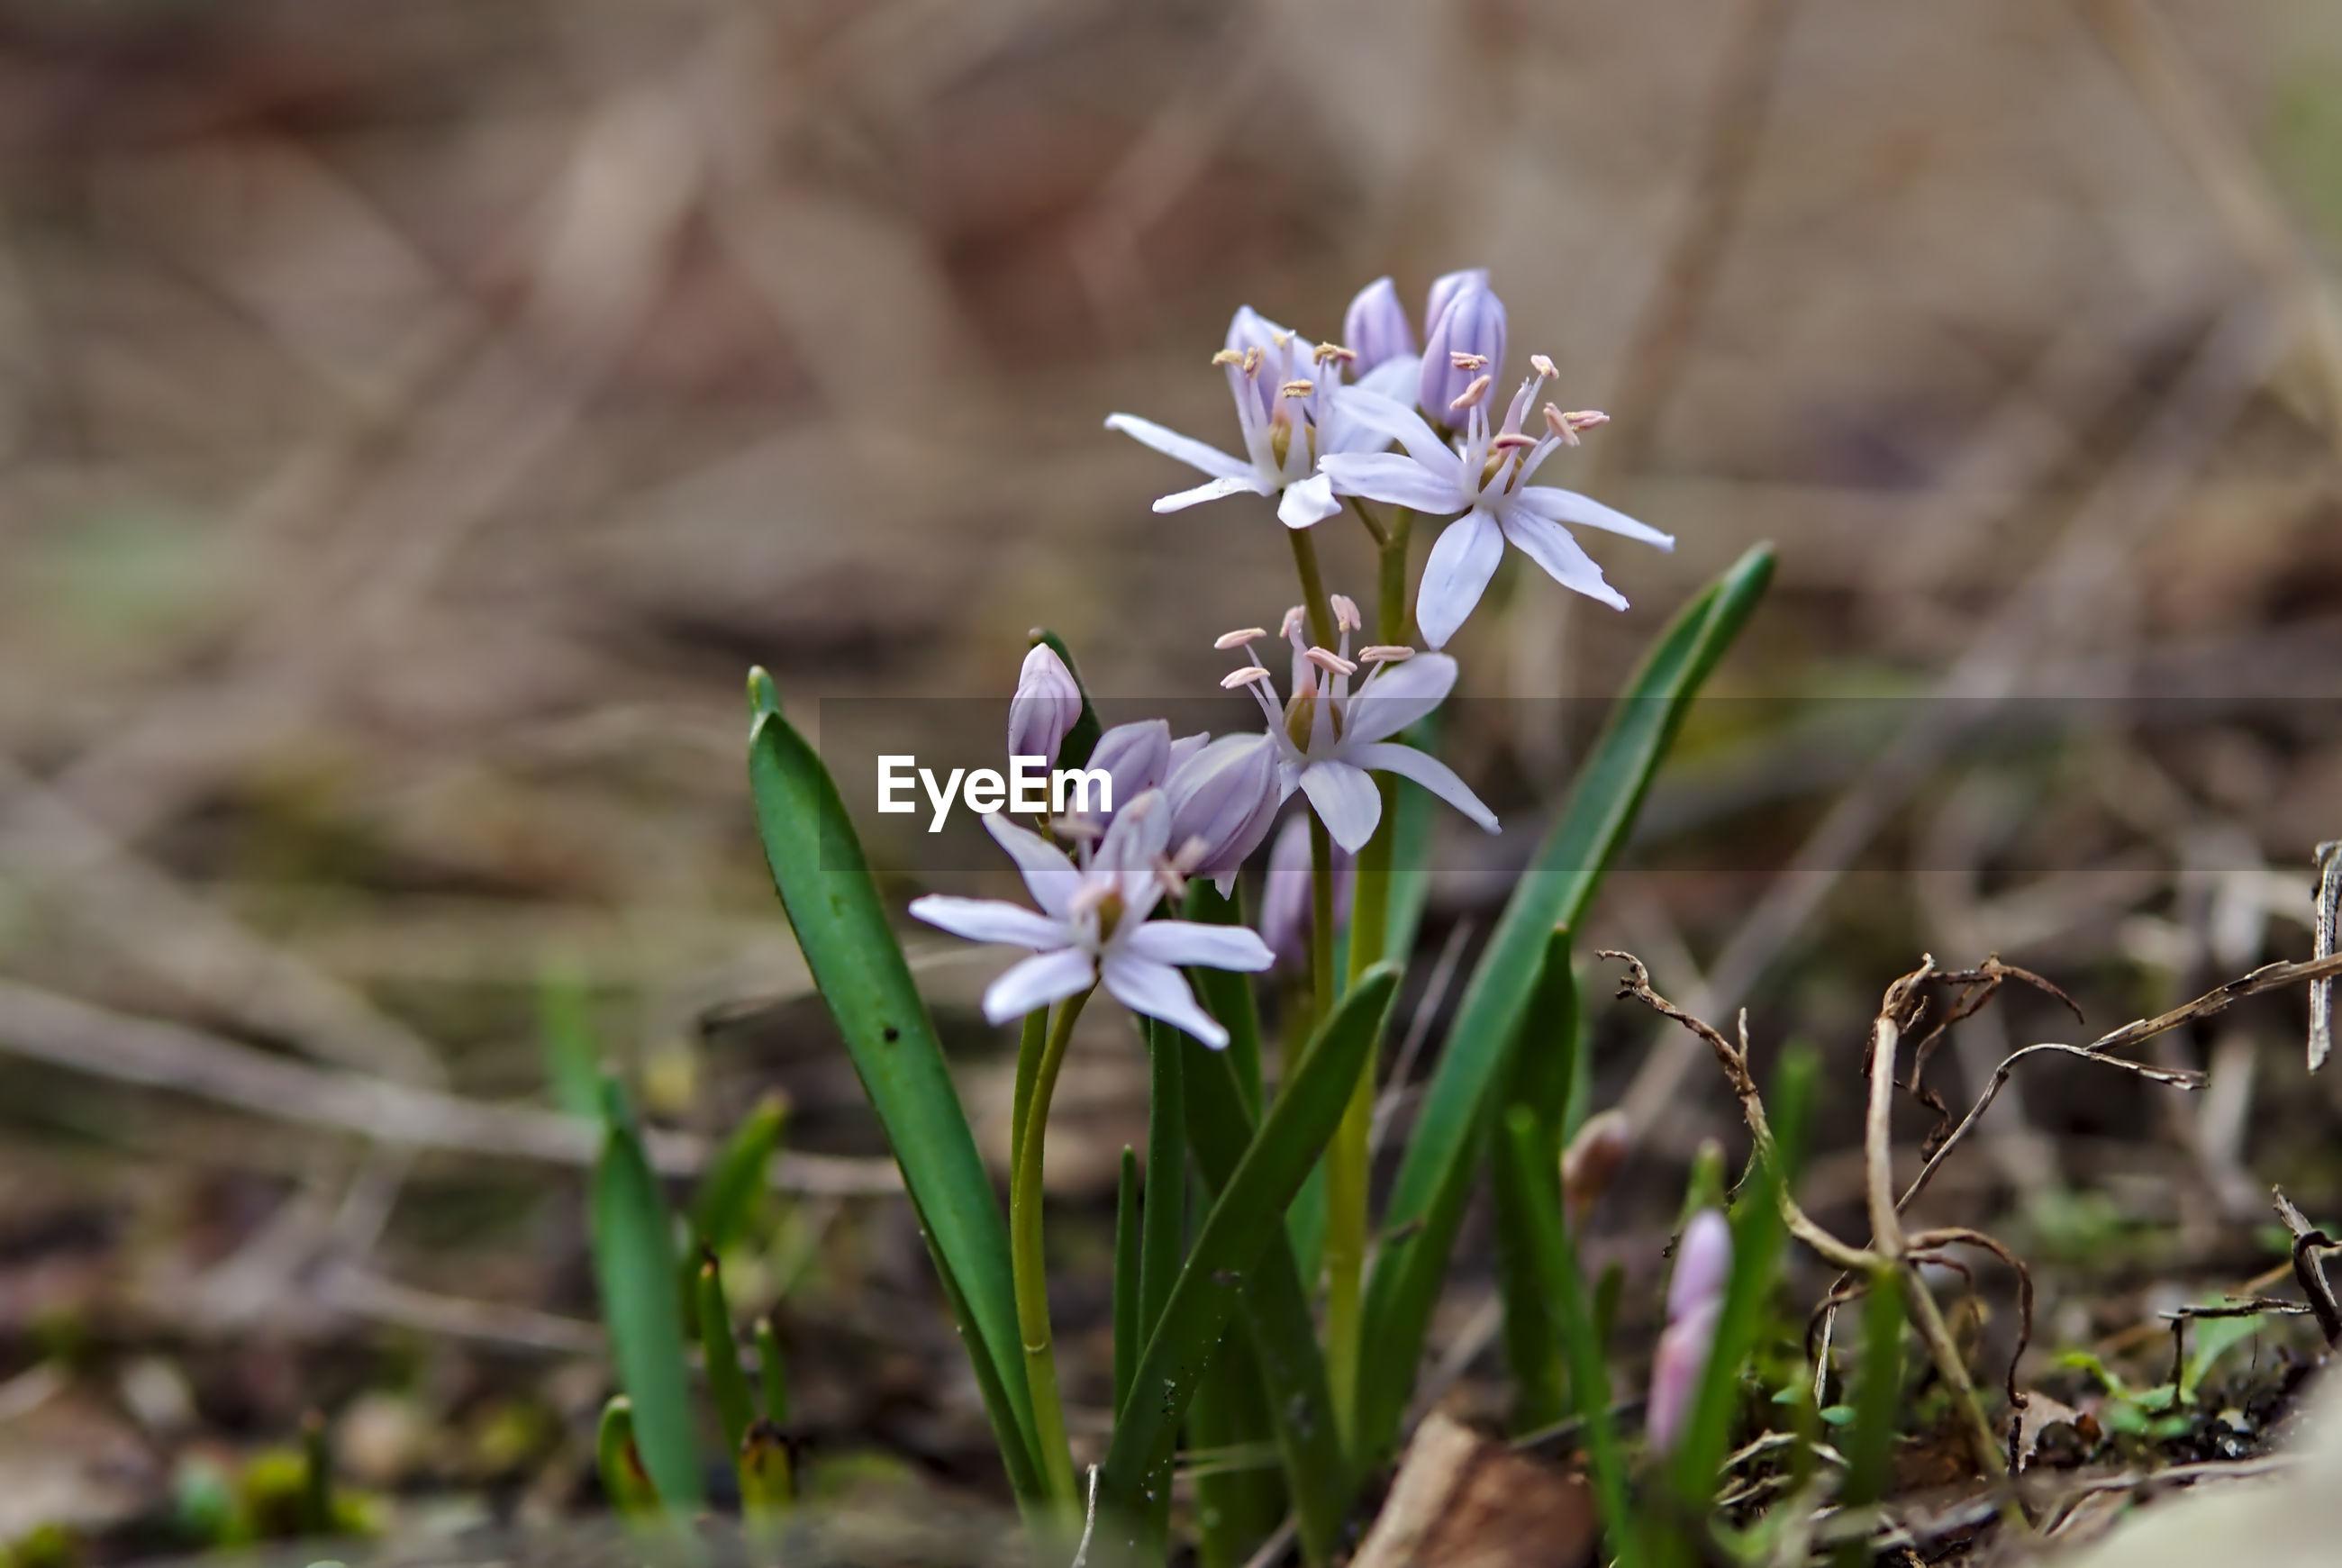 CLOSE-UP OF PURPLE WHITE FLOWER